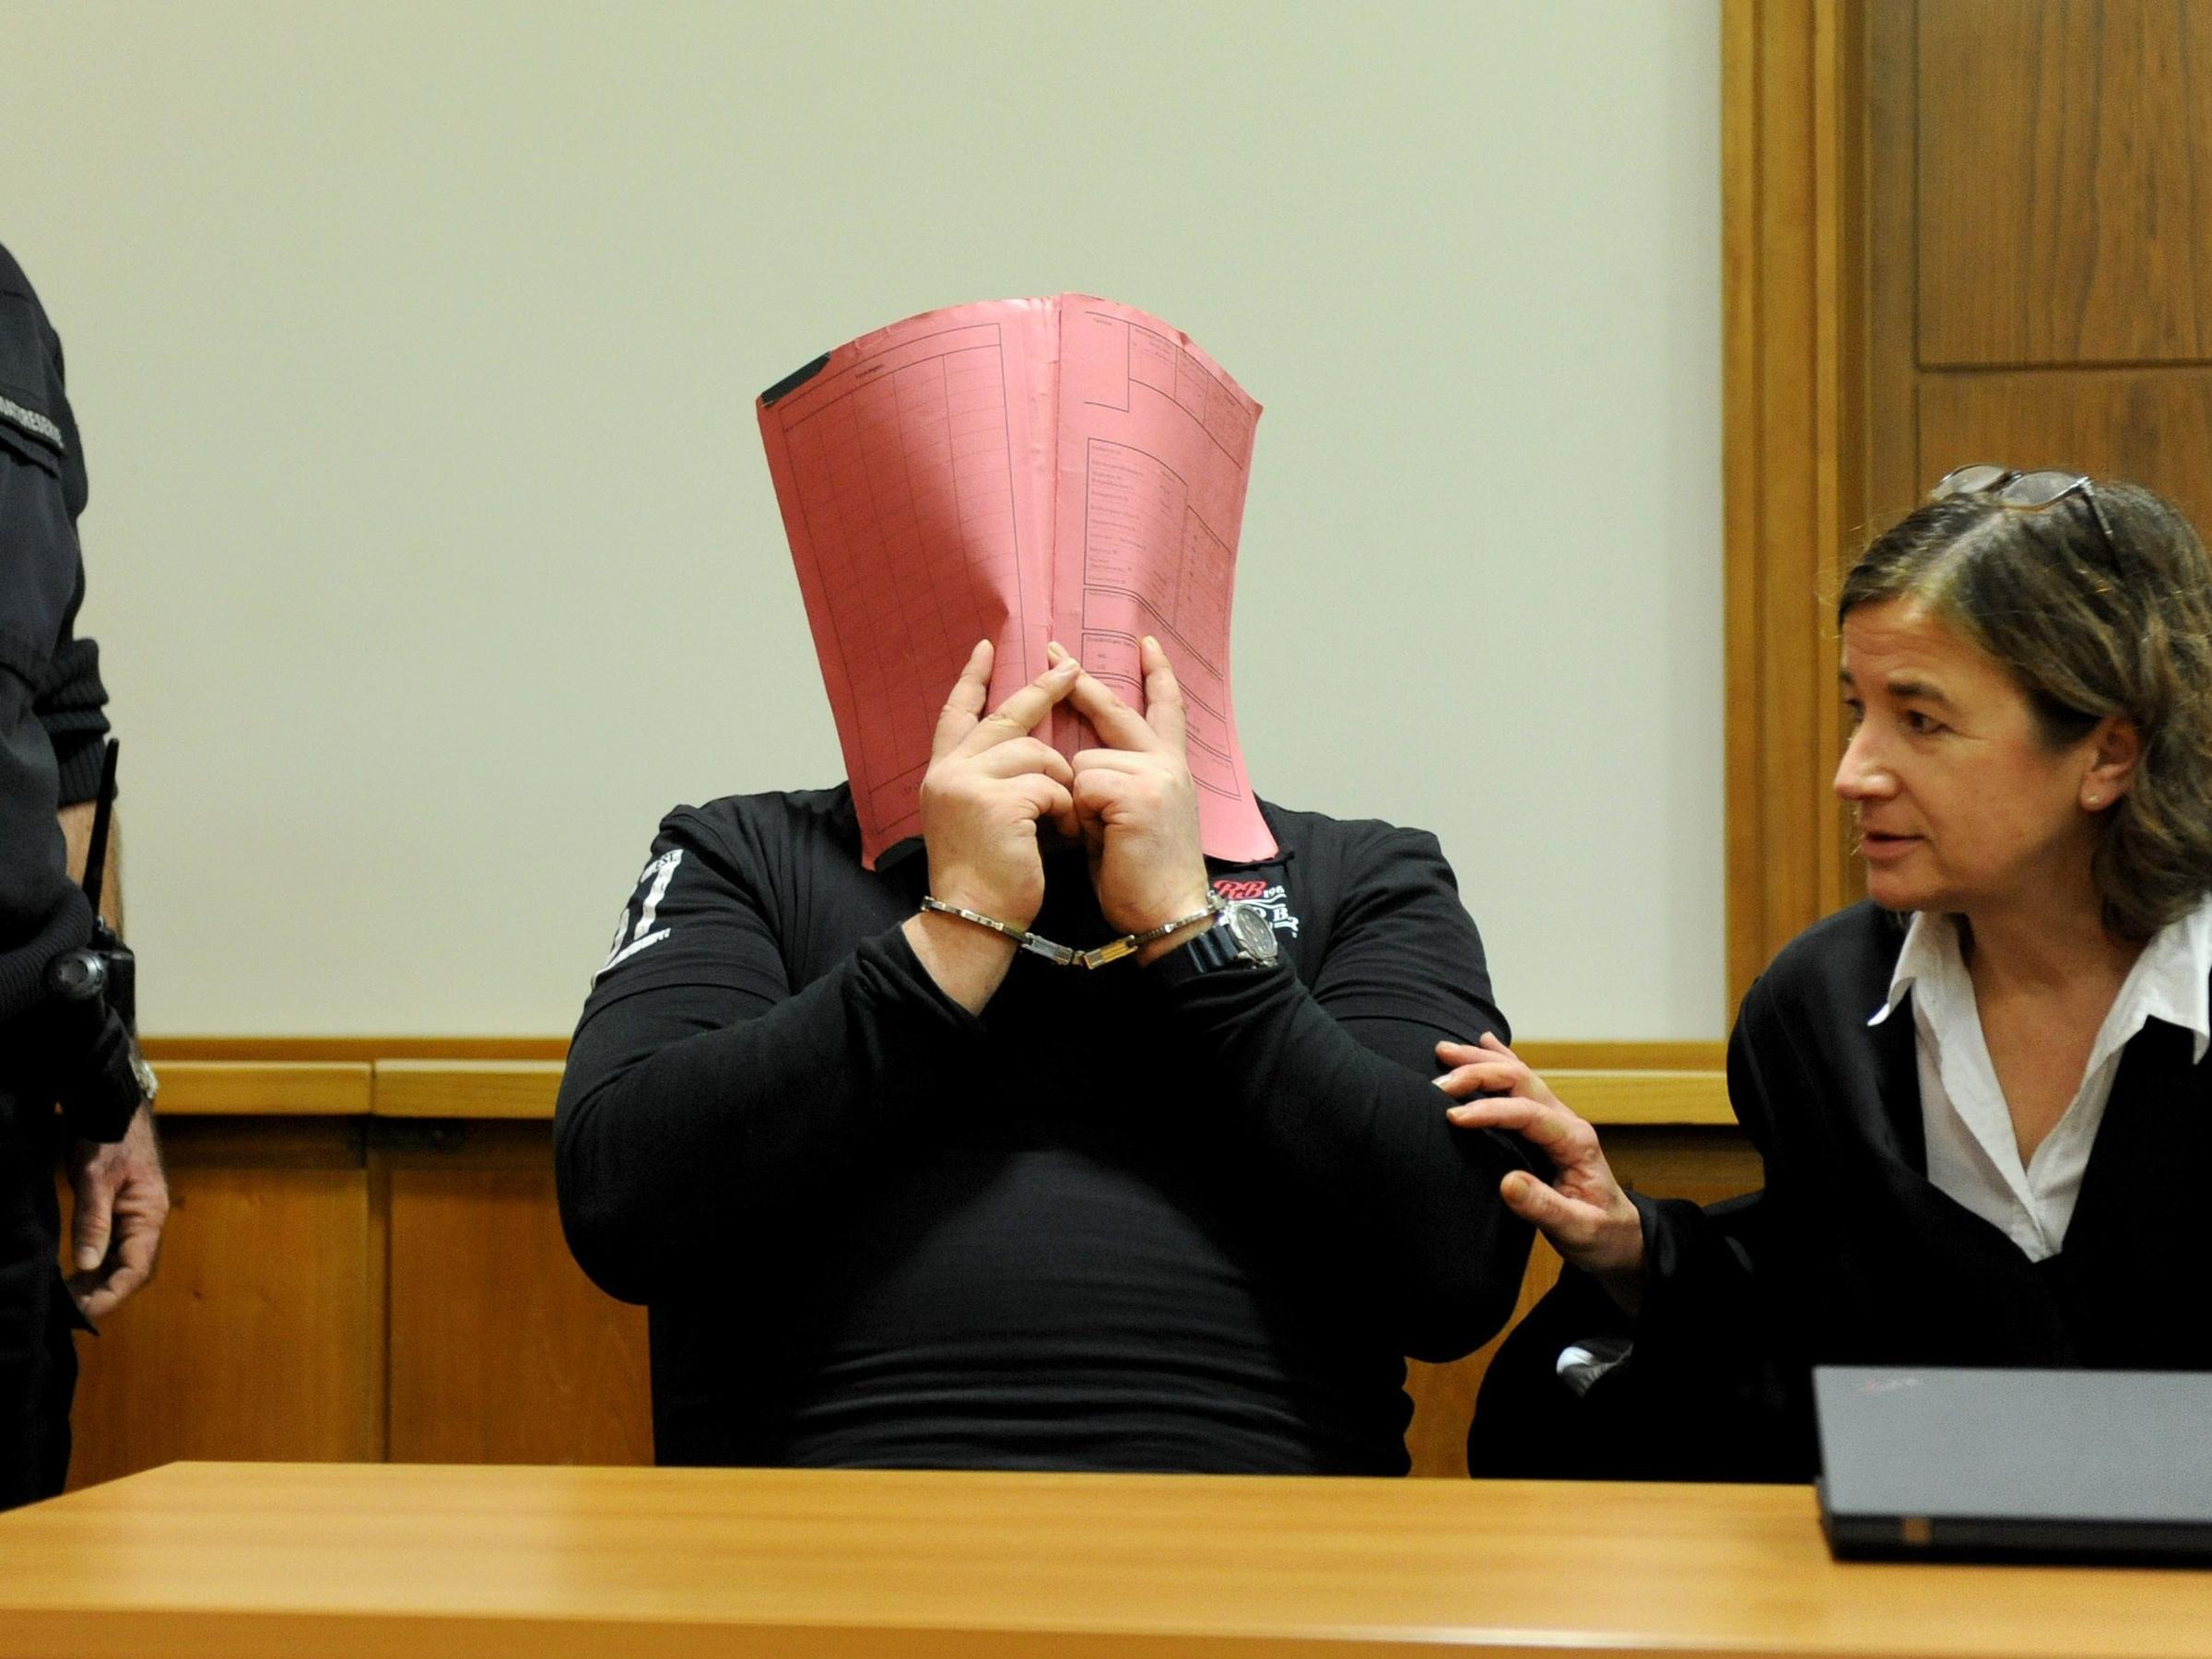 German killer nurse murdered 'at least 90 patients'